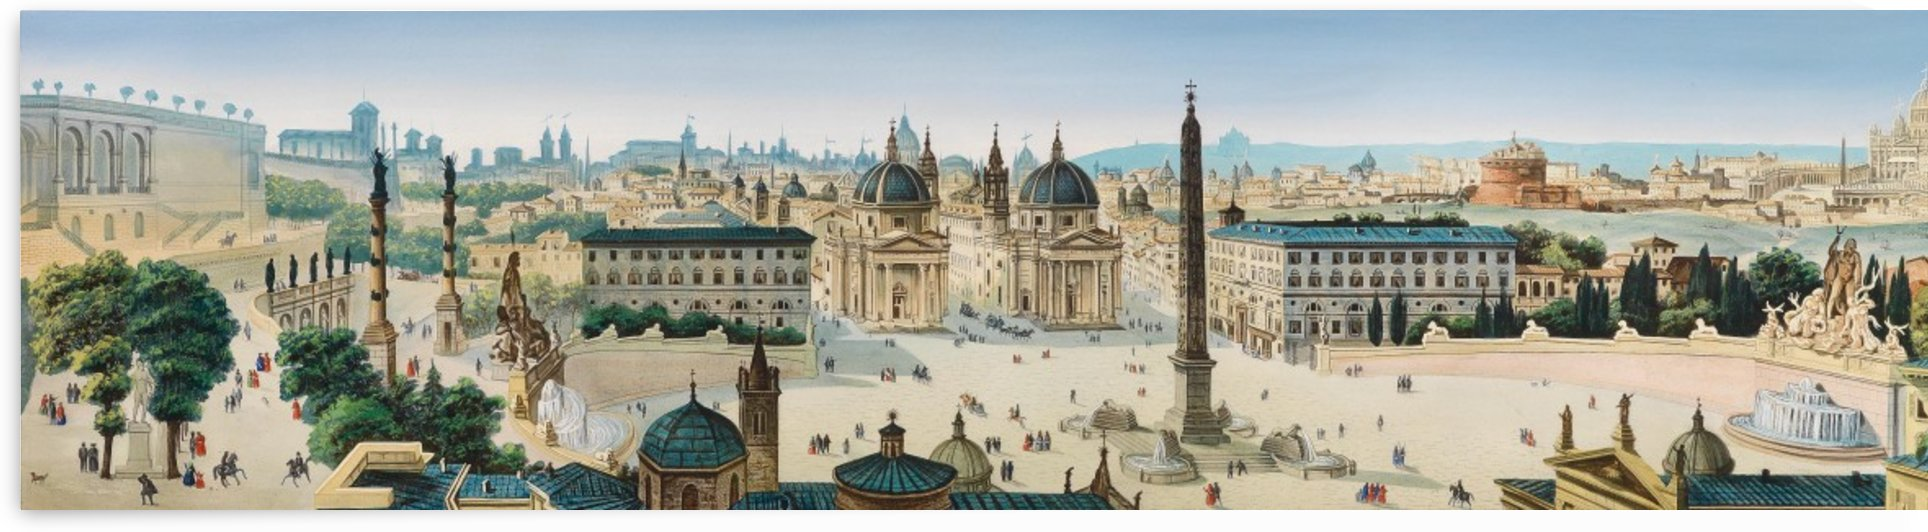 Panorama von Roma by Leopoldo Calvi